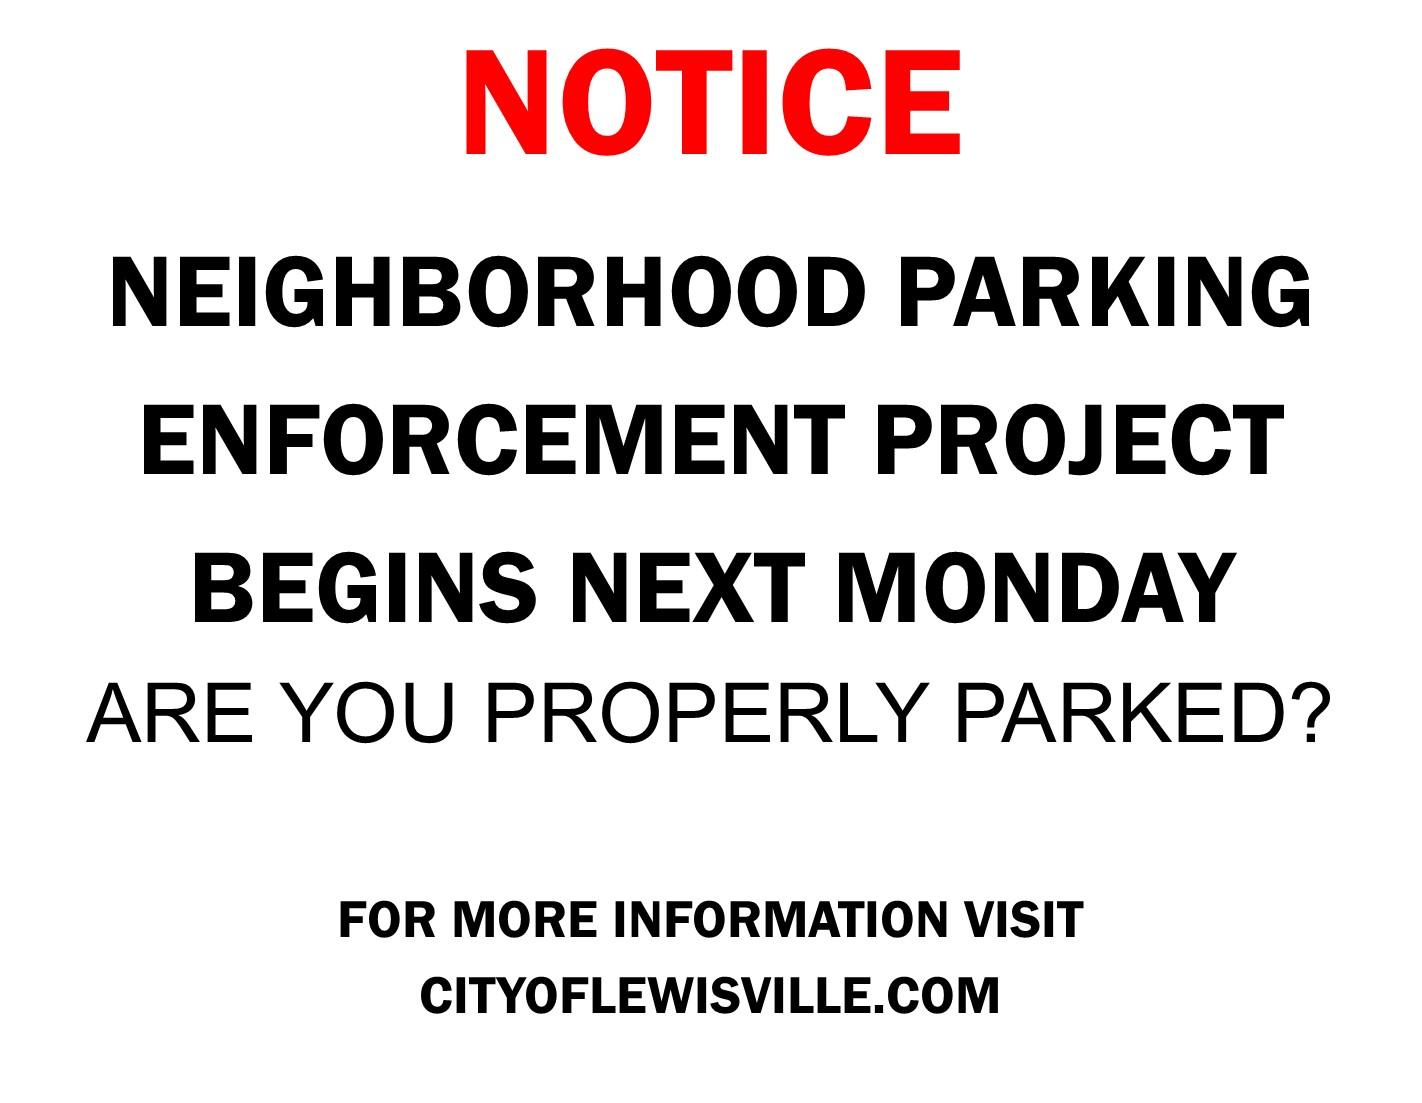 Neighborhood Parking Enforcement Project City Of Lewisville Tx